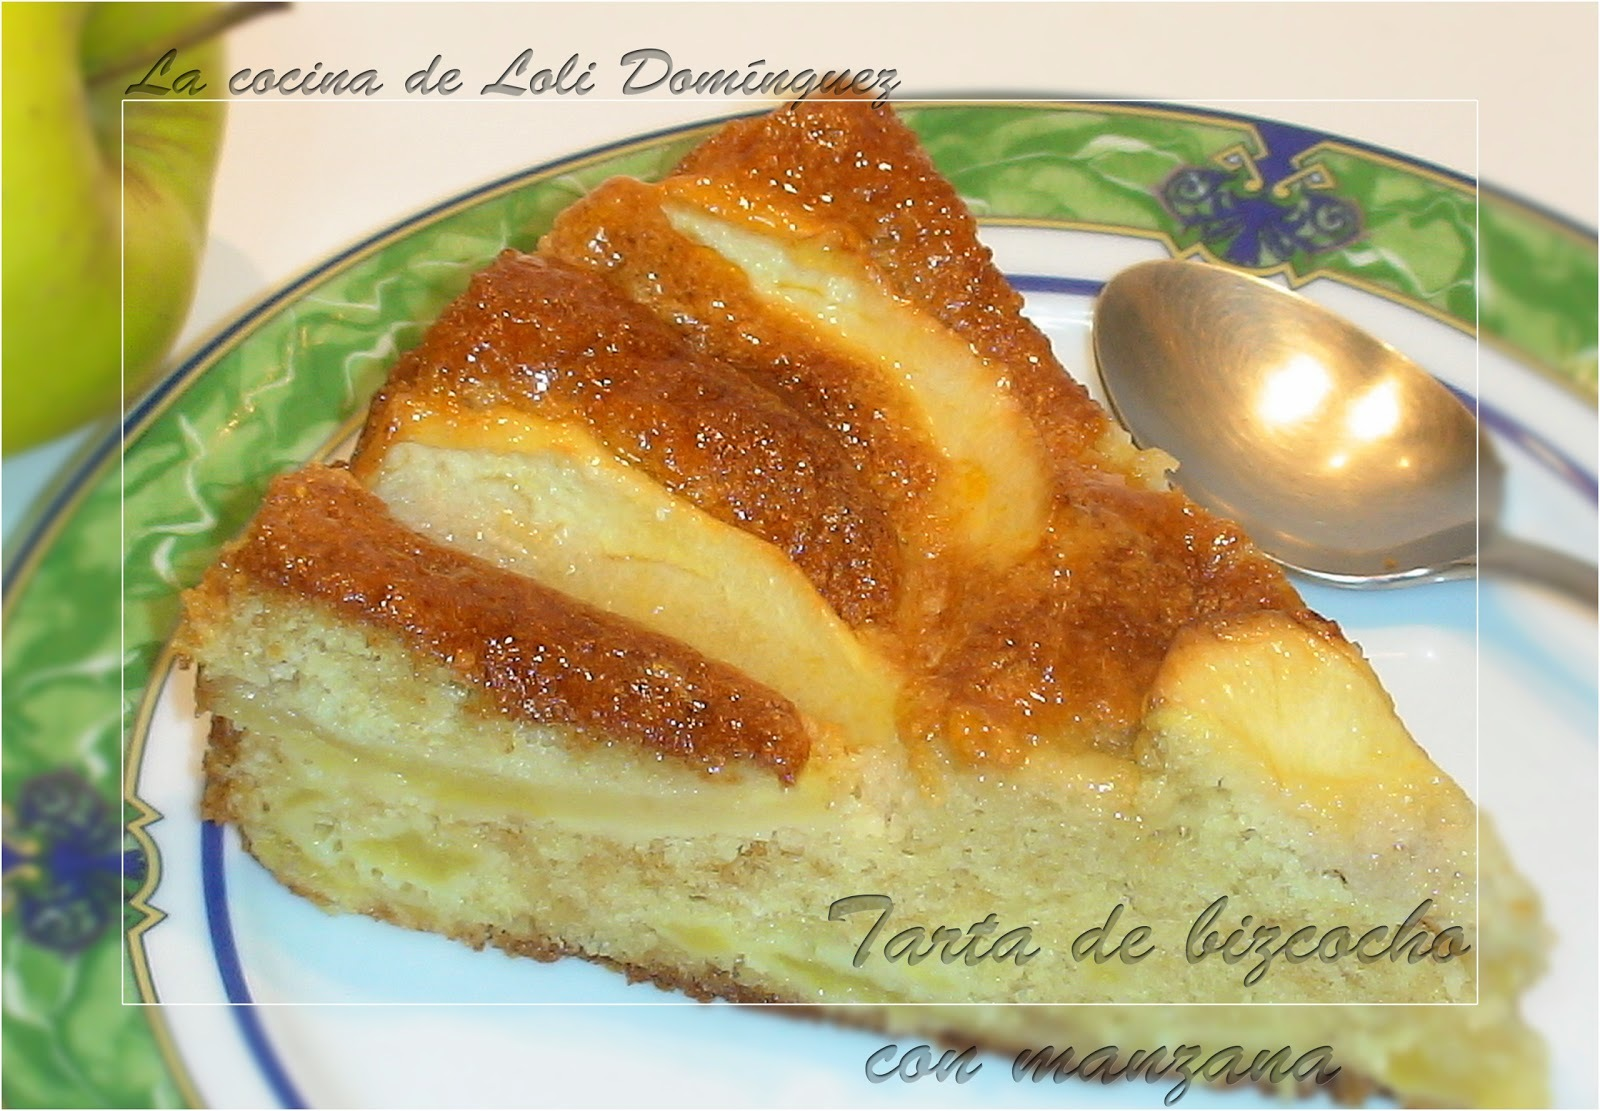 Tarta de bizcocho con manzana